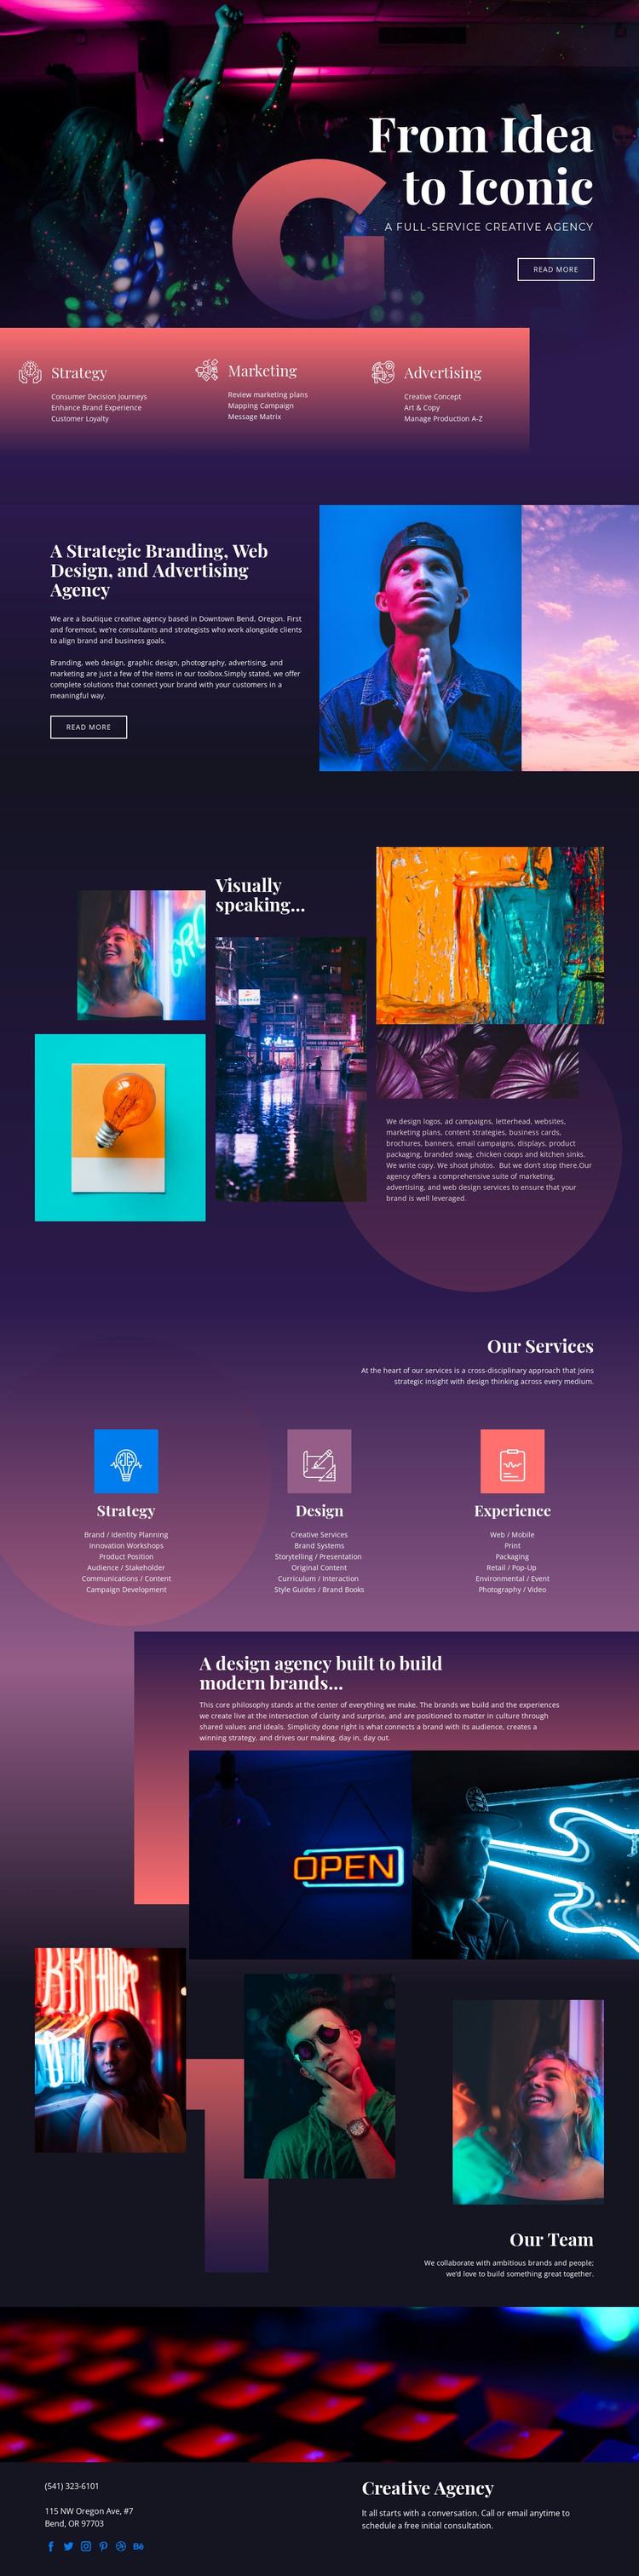 Iconic ideas of art WordPress Theme